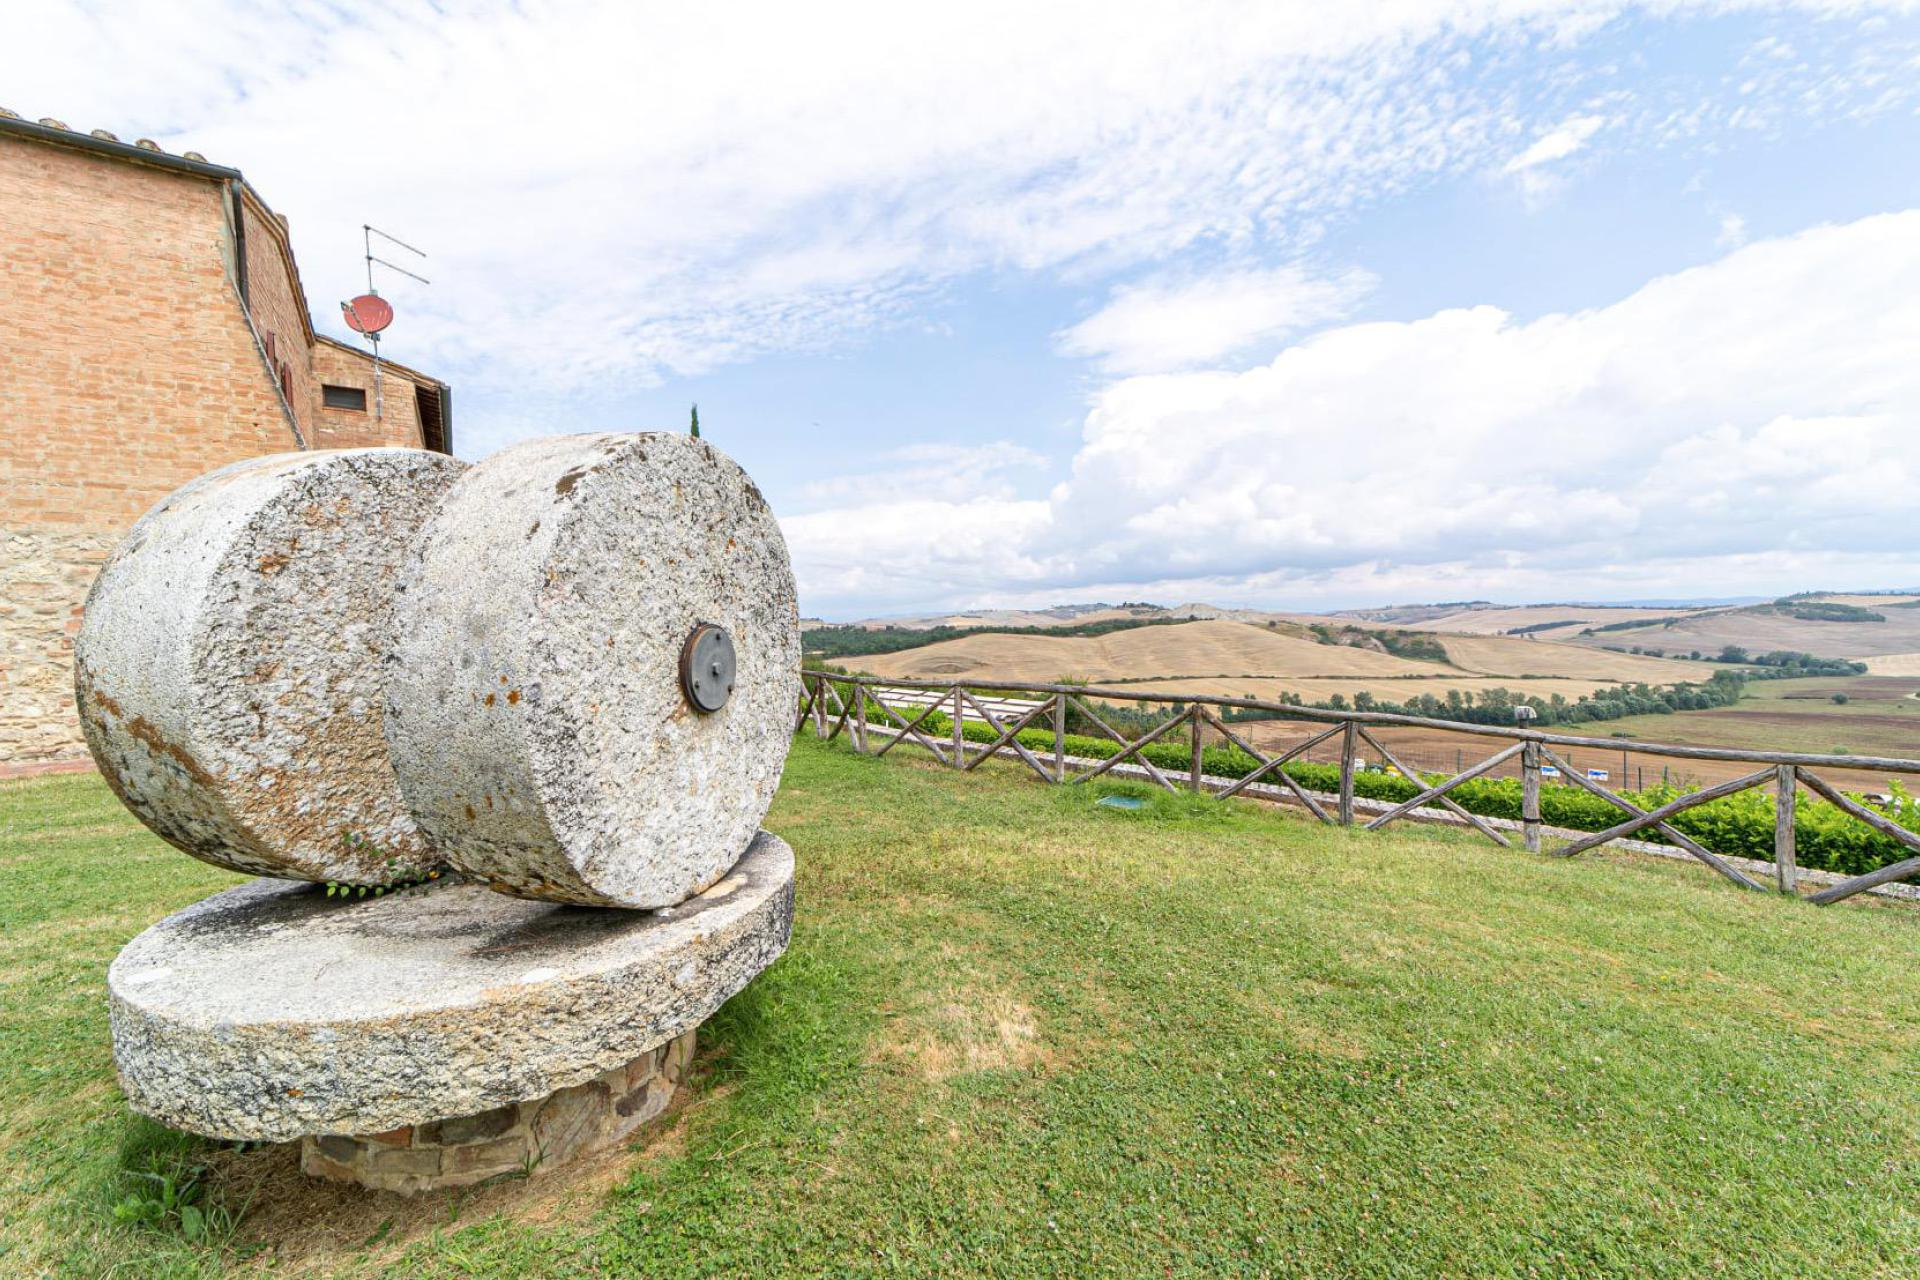 Agriturismo Toskana Agriturismo Toskana mit herrlichem Blick